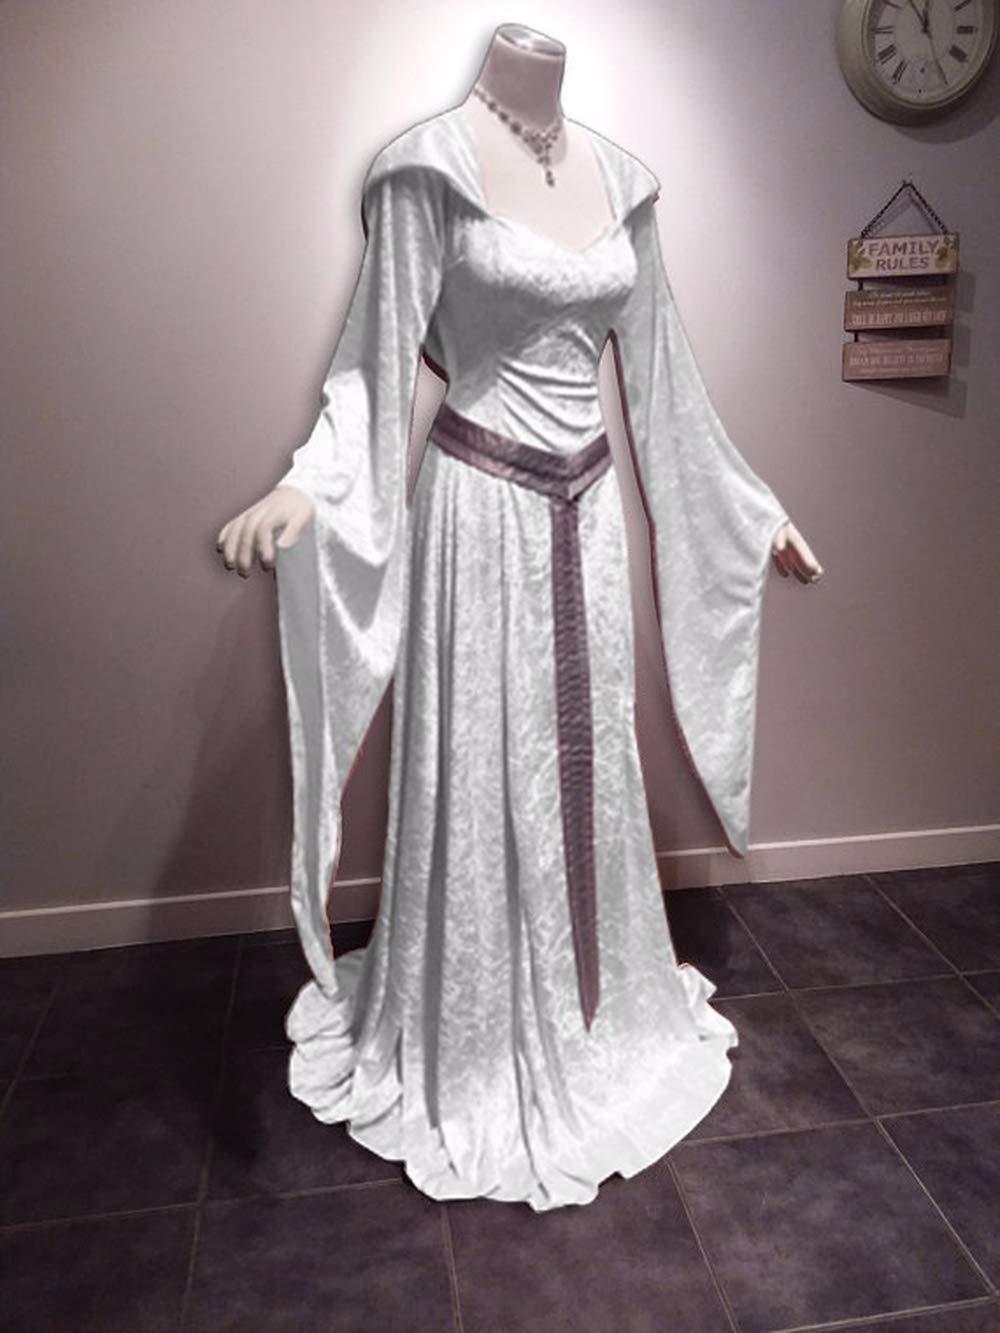 62f60dd1d090 Amazon.com : Plus Size Medieval Vintage Celtic Dress Long Sleeve Suqare  Collar Hooded Floor Length Renaissance Gothic Dress Cosplay Halloween  Costume (Wine ...